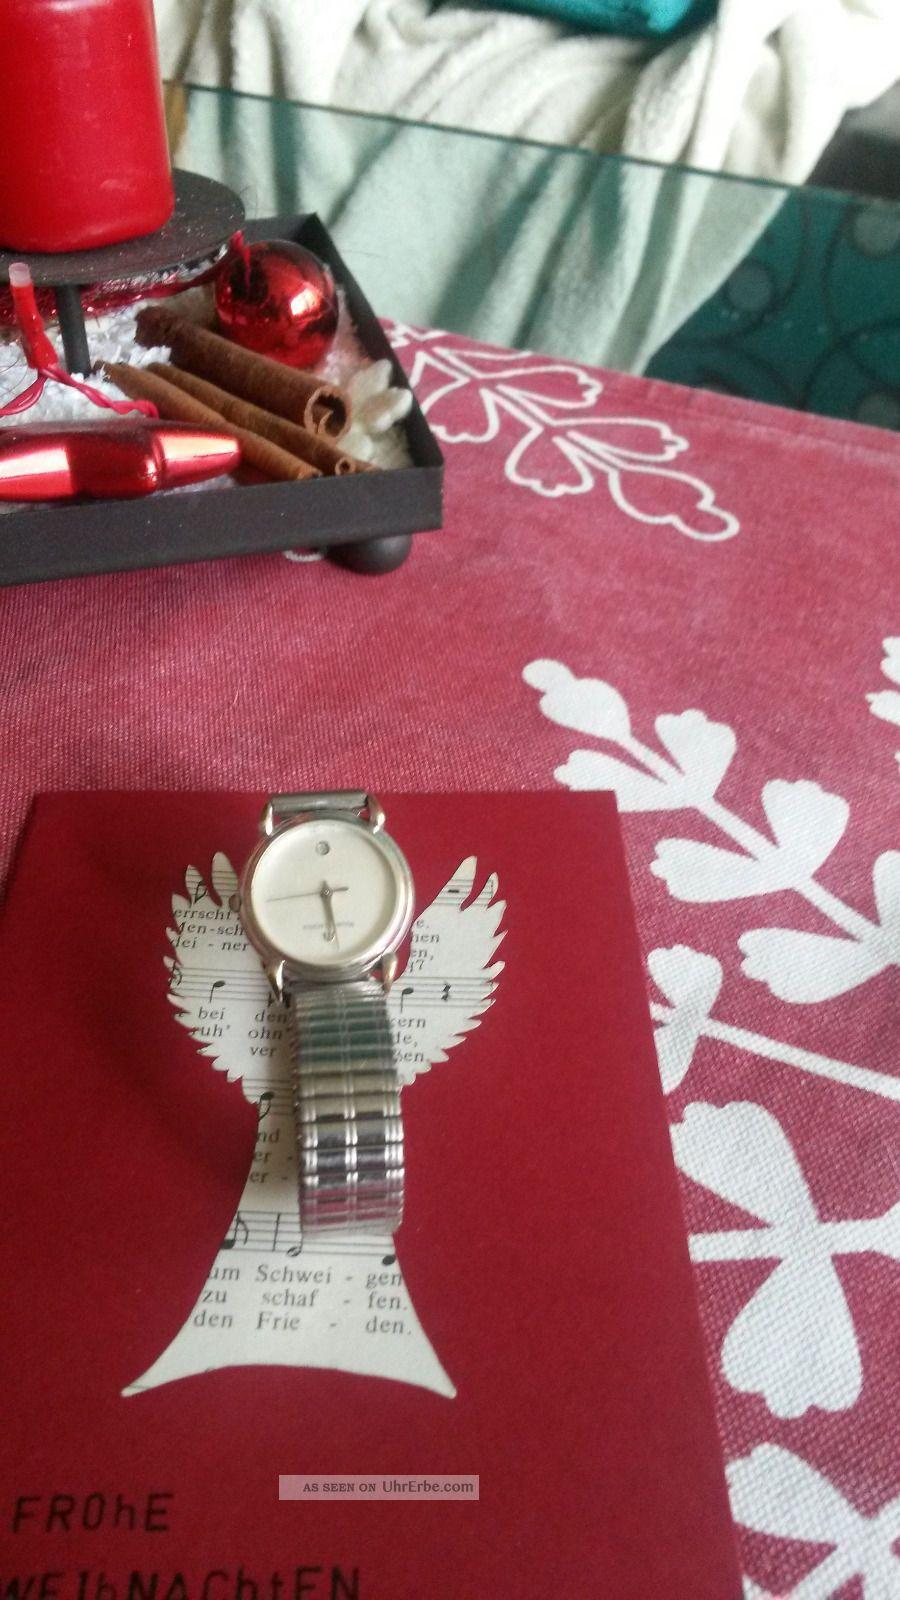 Maurice Lacroix Armbanduhren Bild